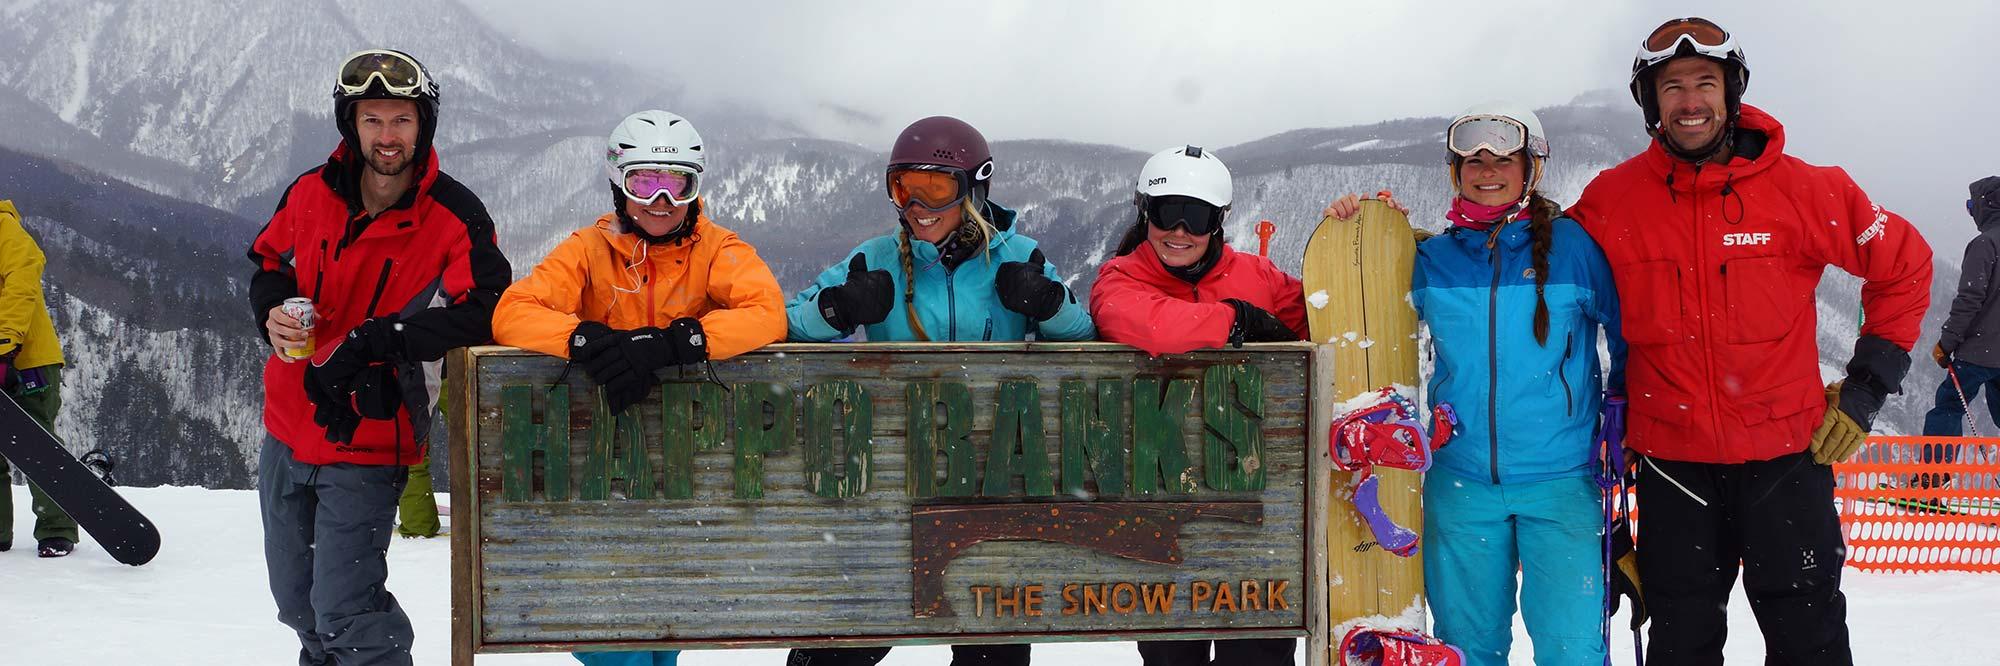 hakuba ski resort guiding